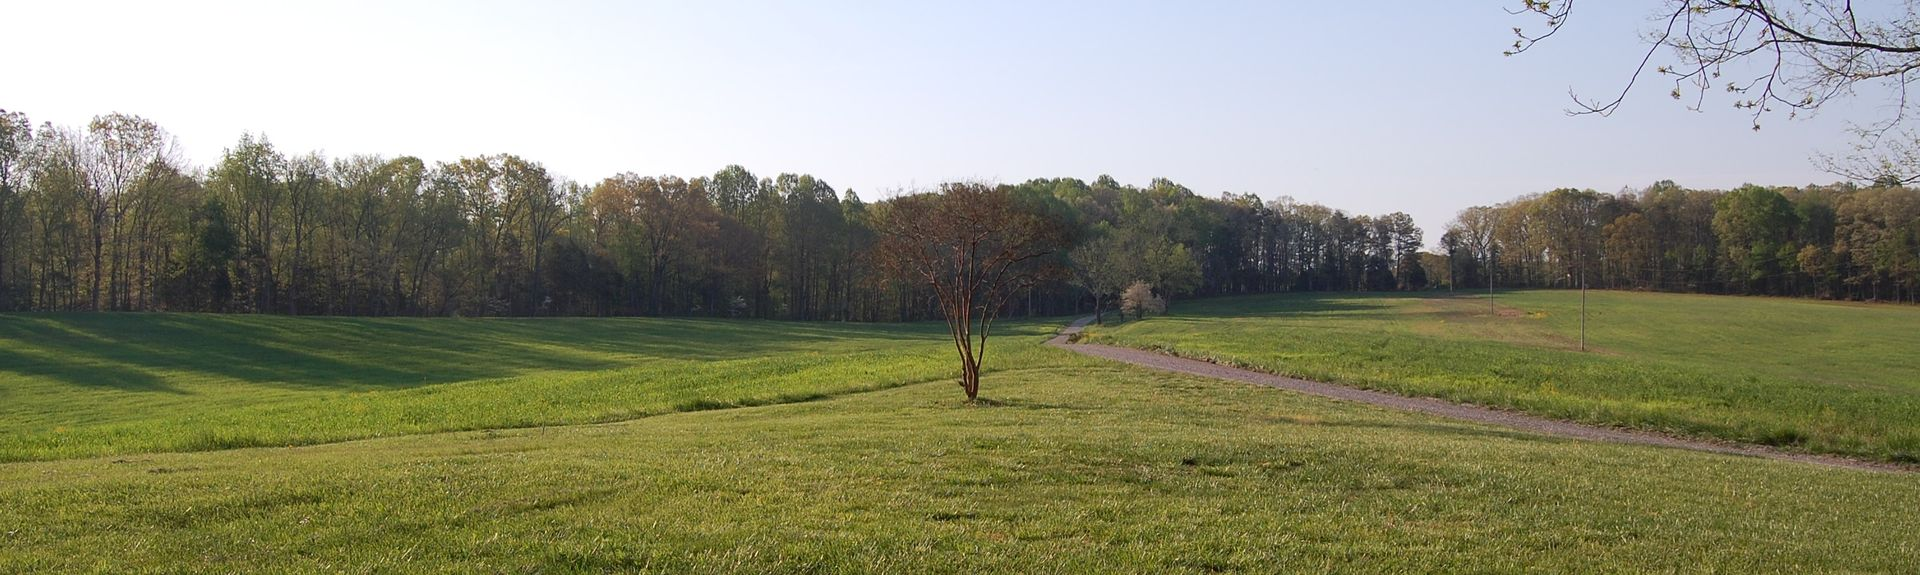 Powhatan, Virginia, Verenigde Staten